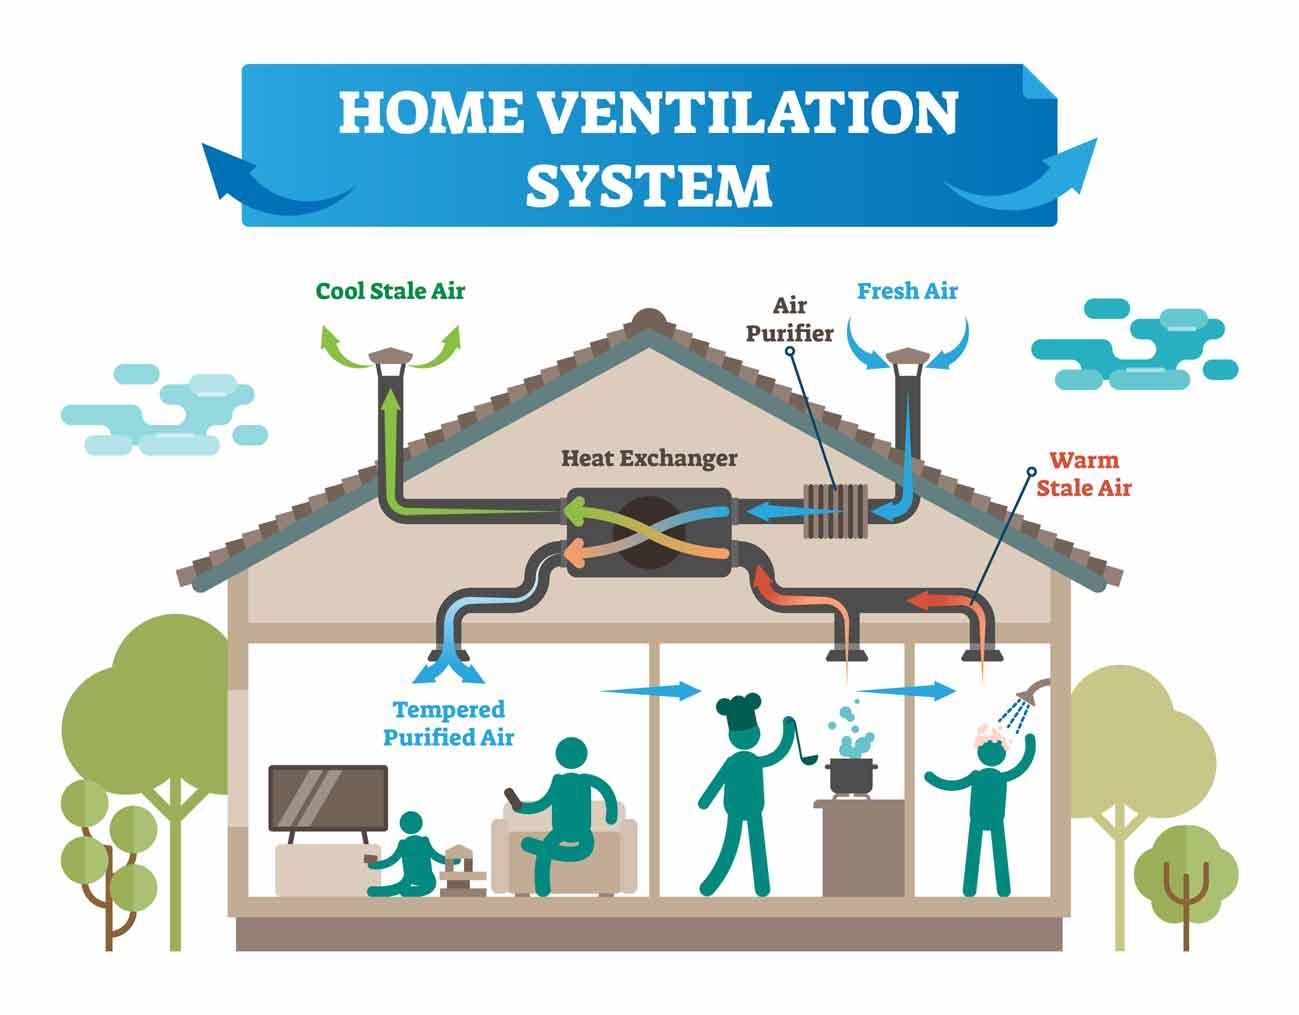 Home Ventilation System HRV